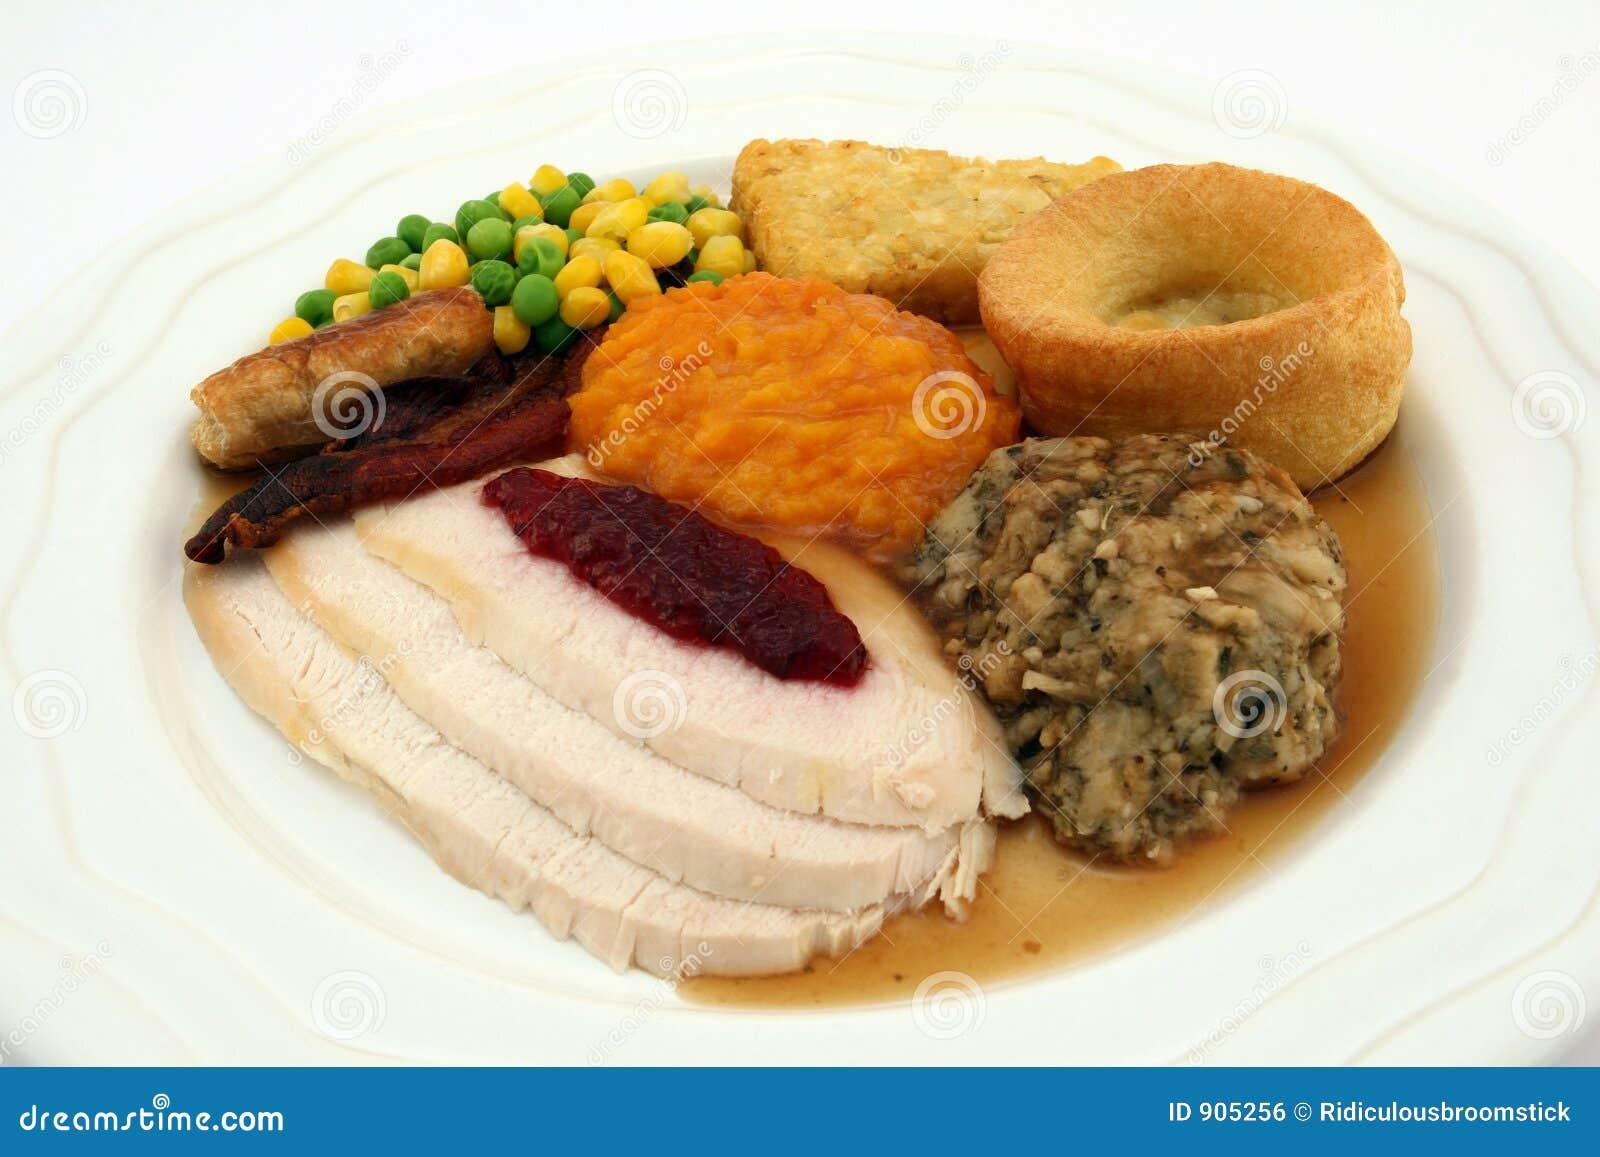 Sunday Roast - Thanksgiving Turkey Dinner Royalty Free ...